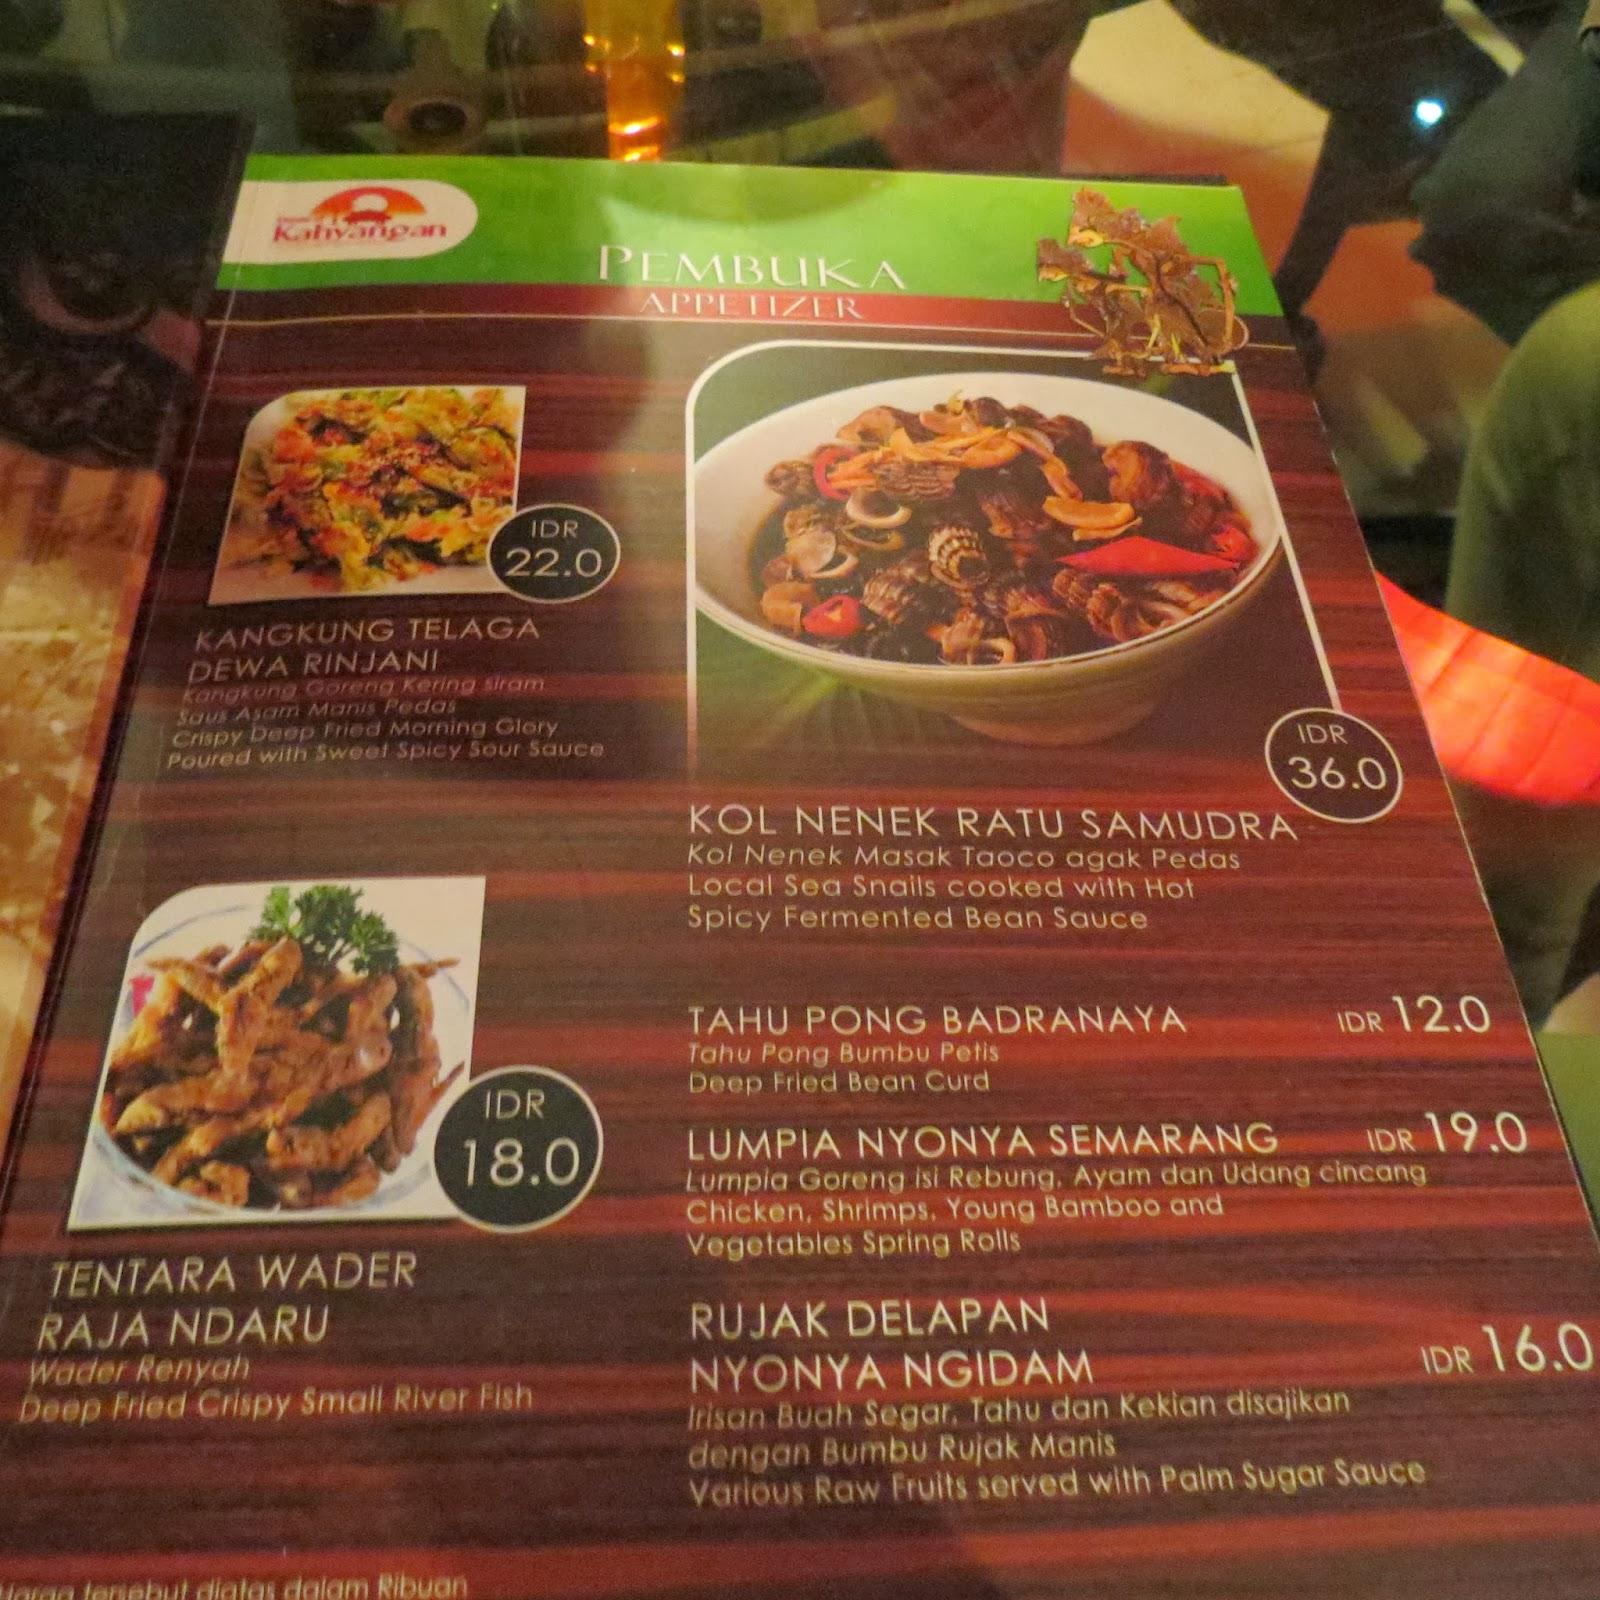 Surabaya Resto Walk Kahyangan Food Restaurant Stalls Art Kota